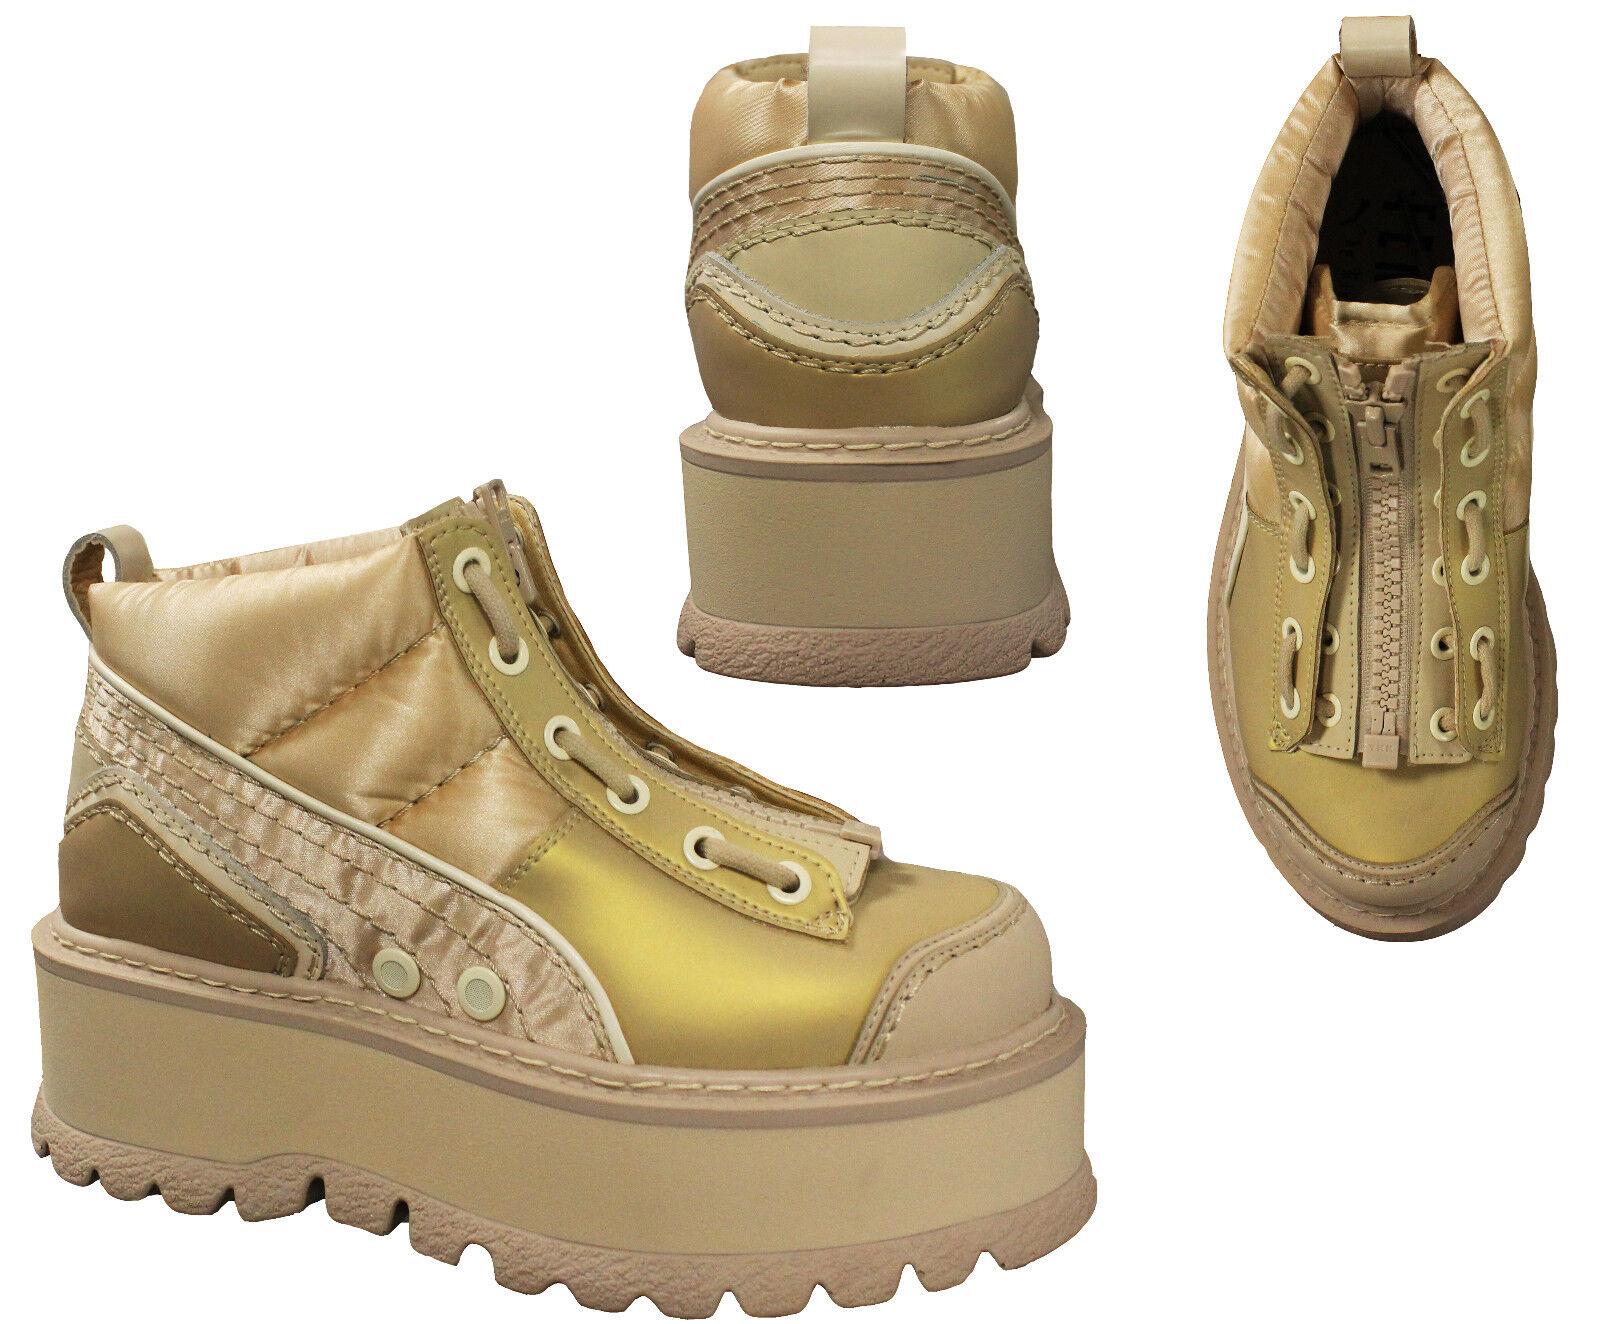 Details about Puma x FENTY from Rihanna Sneaker Boot Zip Platform Sports Woman 365775 01 b8b show original title